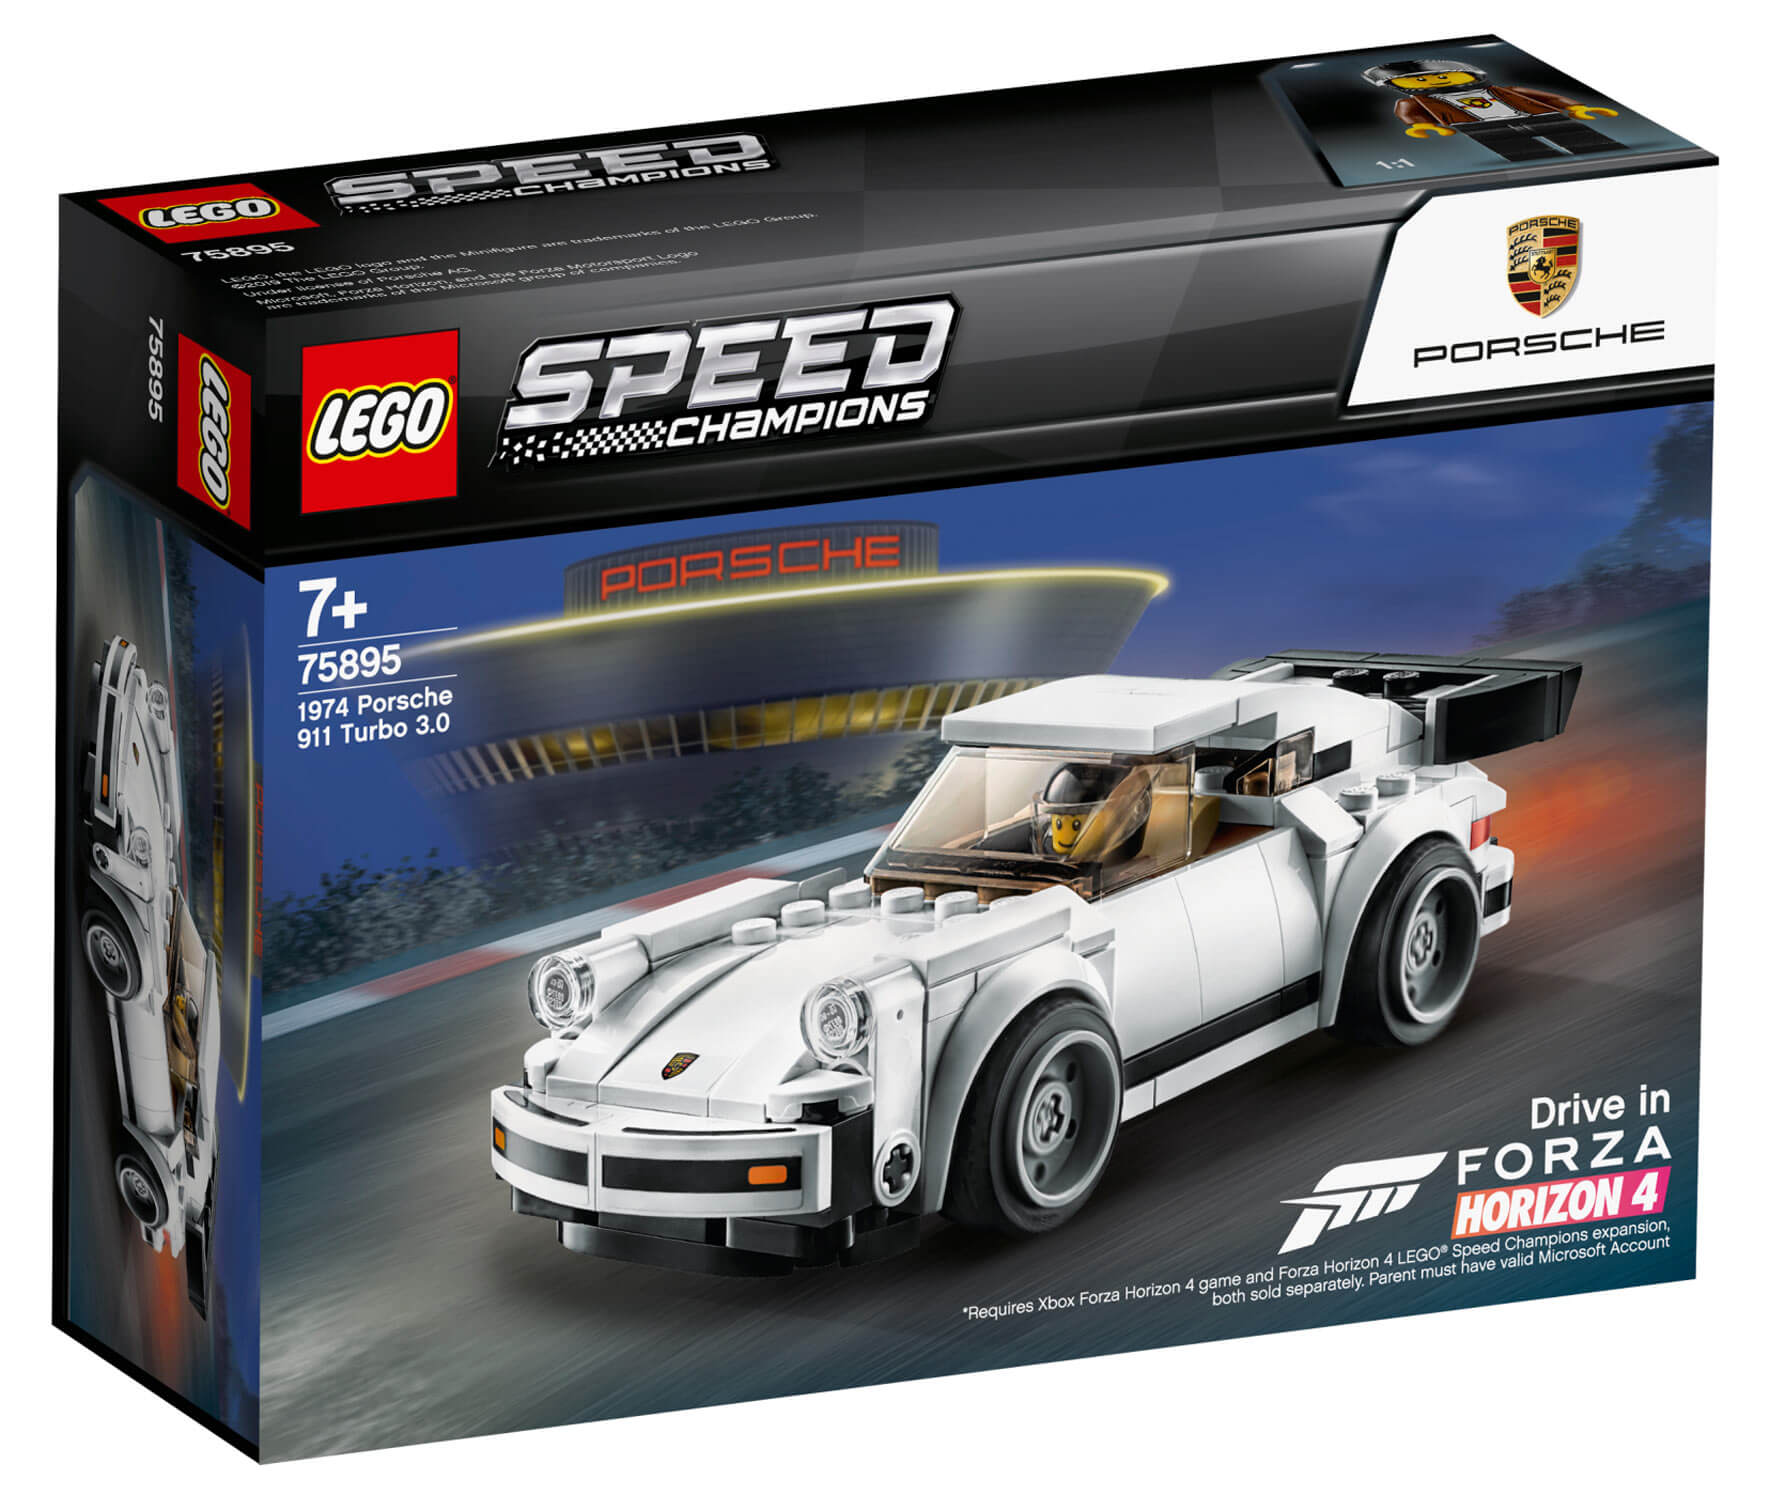 75895 Lego Speed Champions 1974 Porsche 911 Turbo 3 0